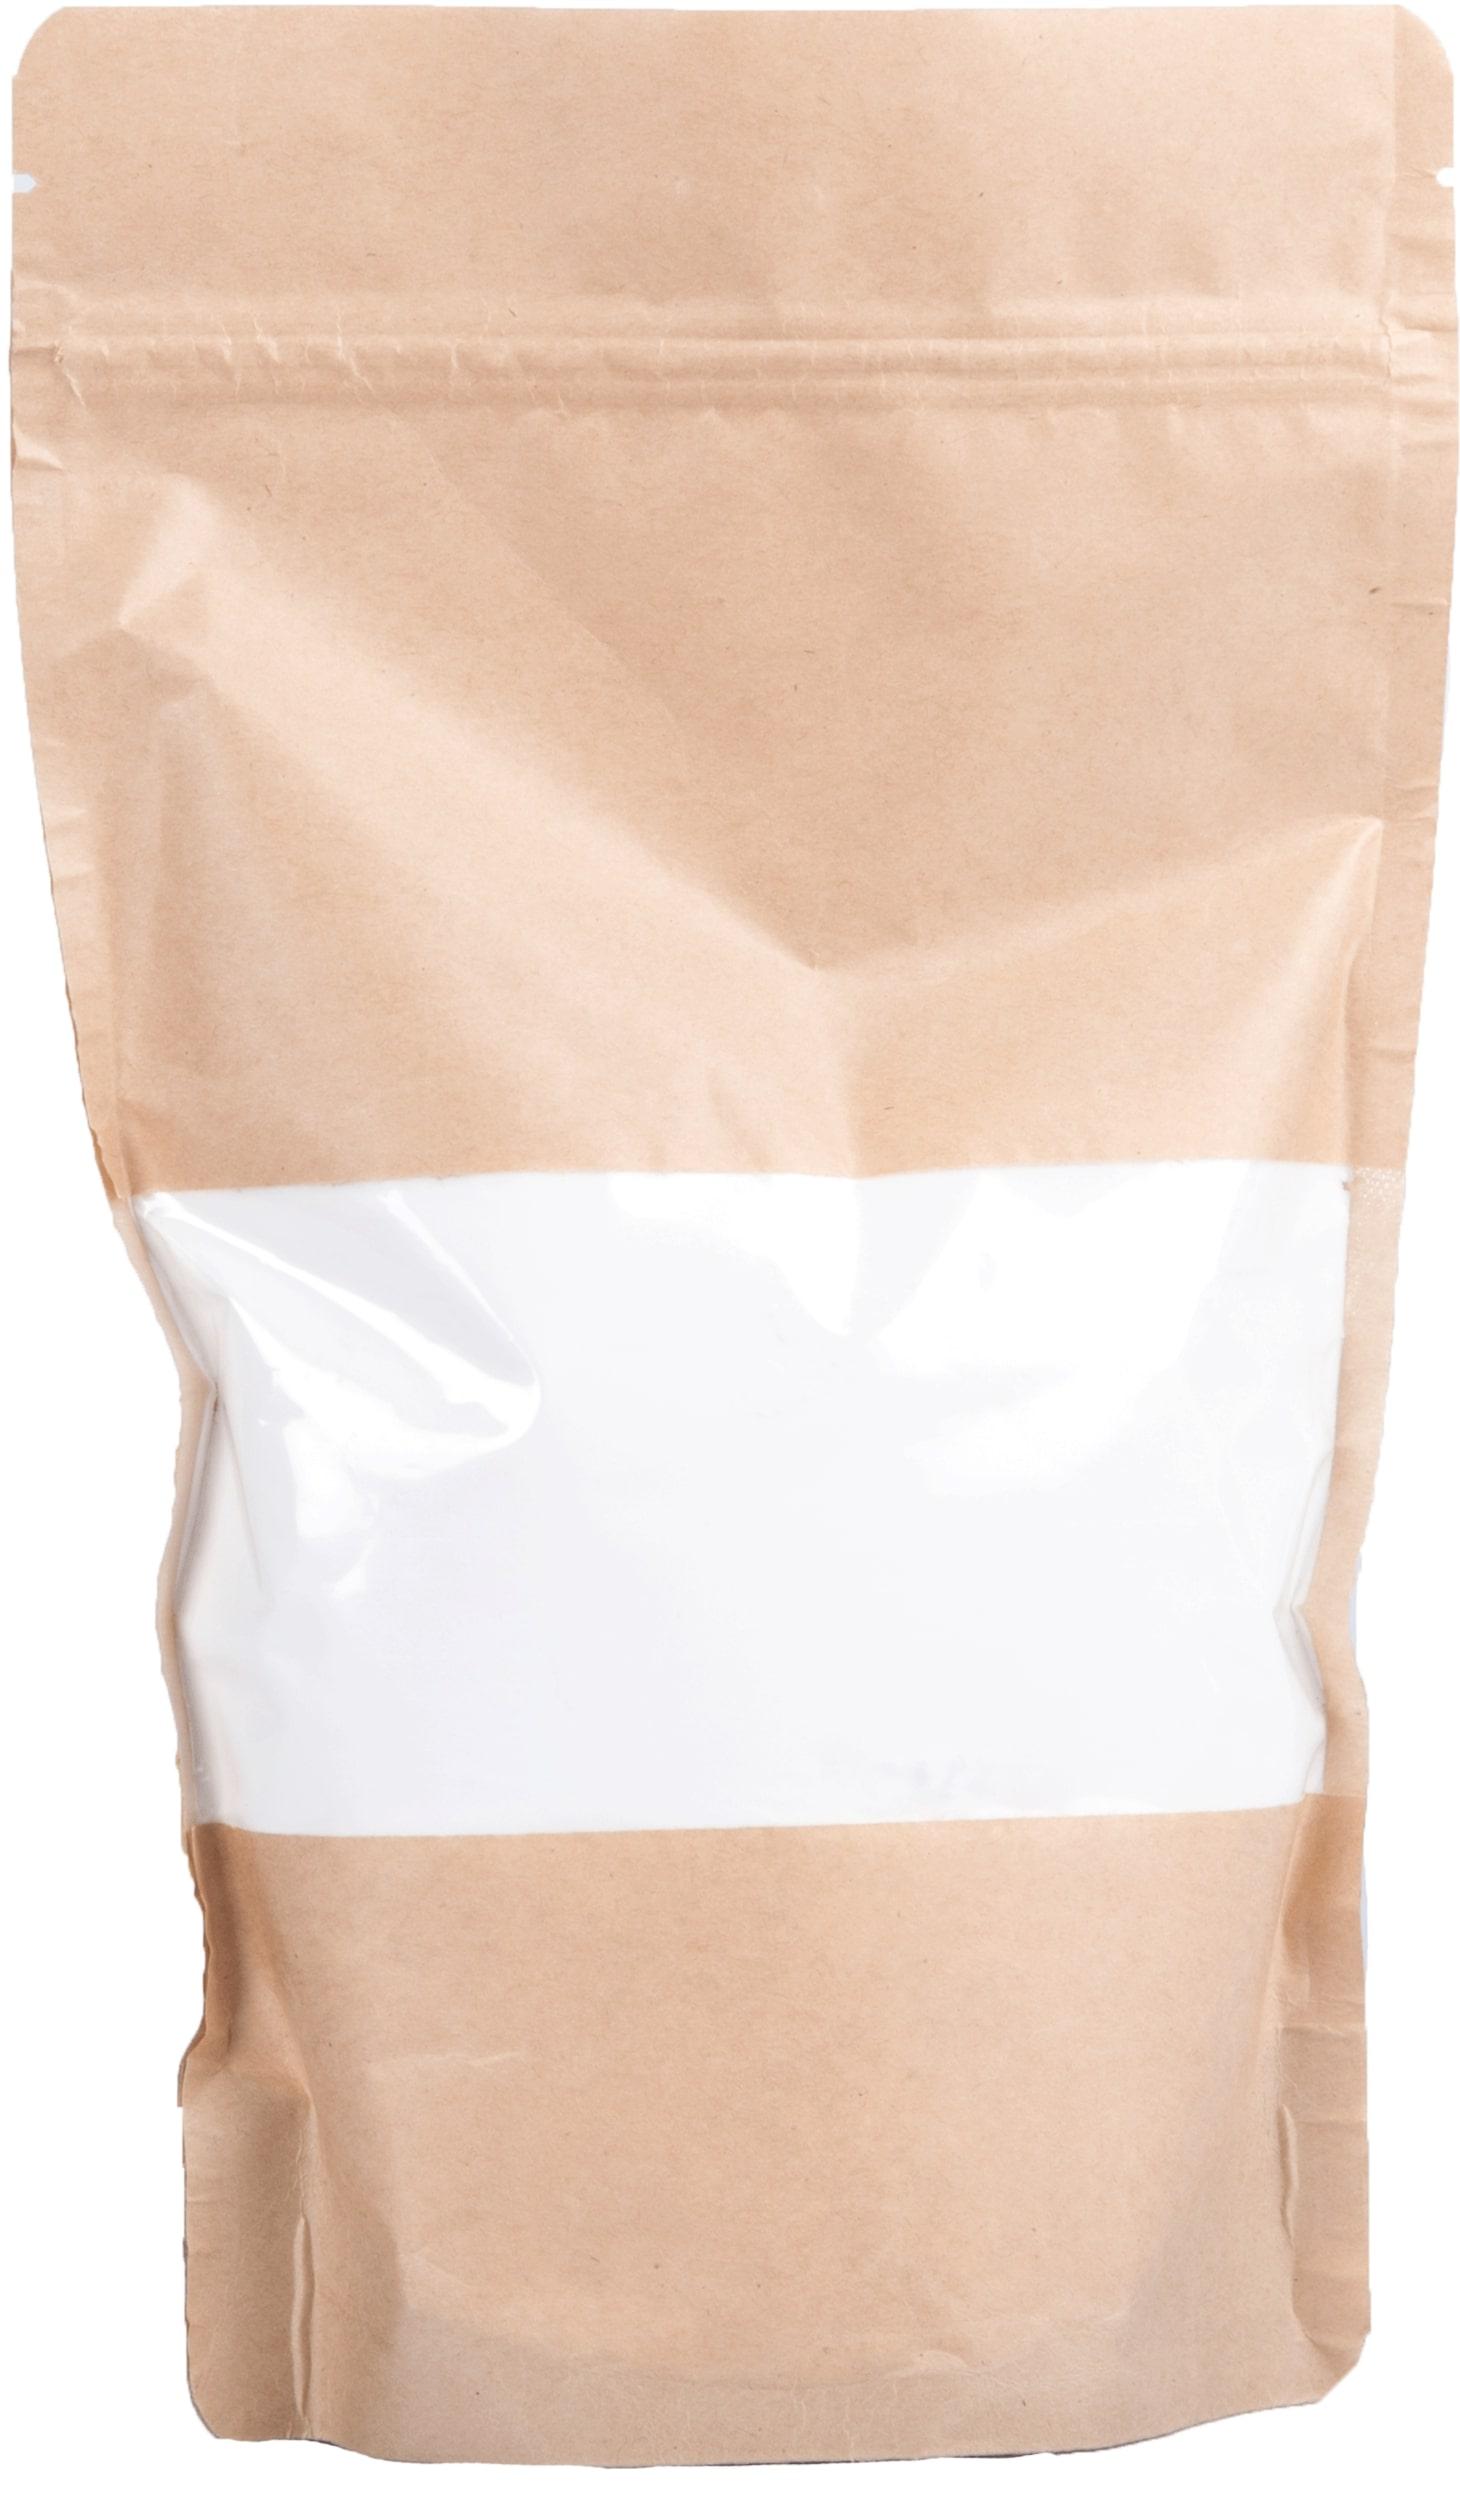 Nachfüllung Bicarbonate de Soude / Baking Soda - 750g